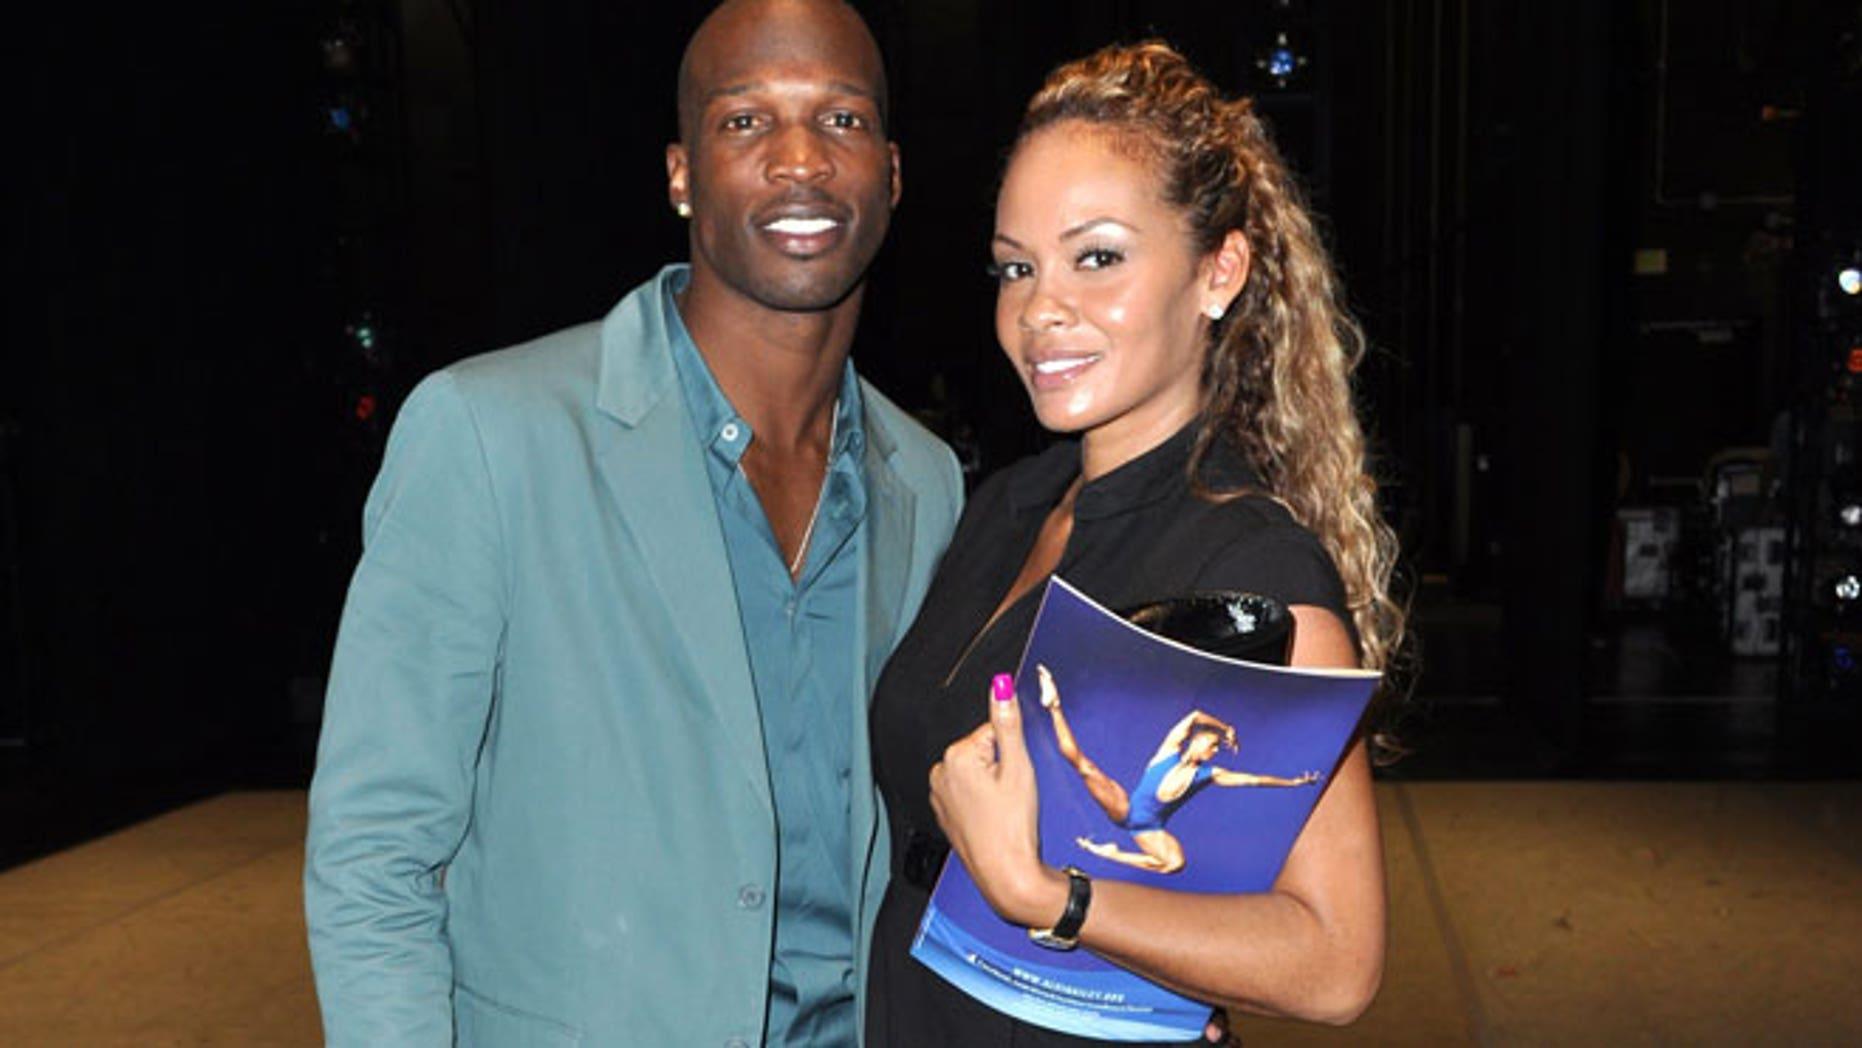 FILE:  Chad Ochocinco and Evelyn Lozada in February, 2011